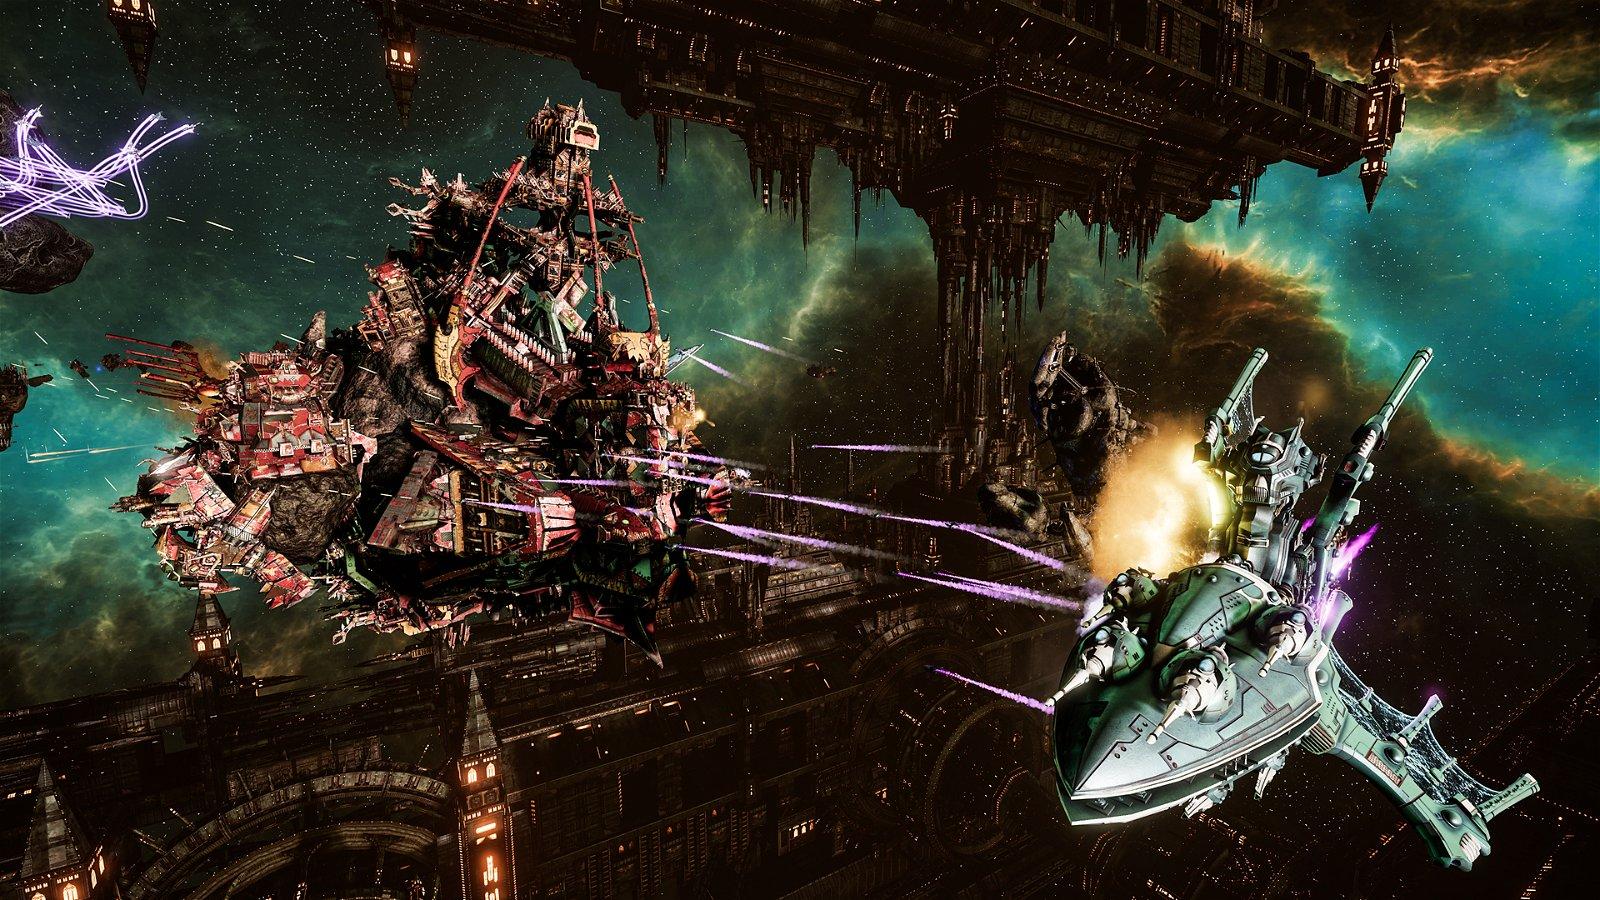 Battlefleet Gothic: Armada 2 (Pc) Review